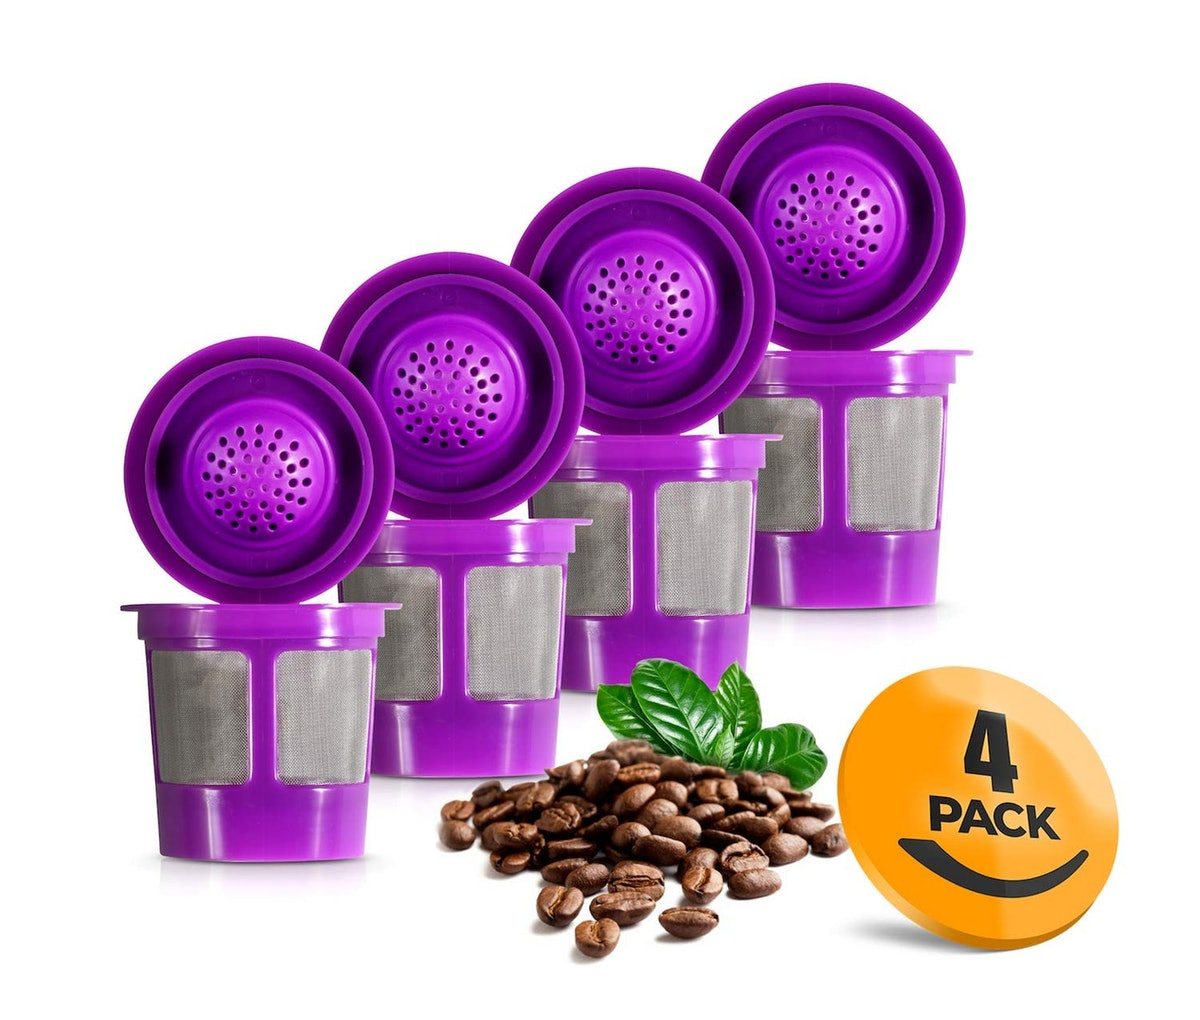 K&J Reusable K-Cups (4-Pack)